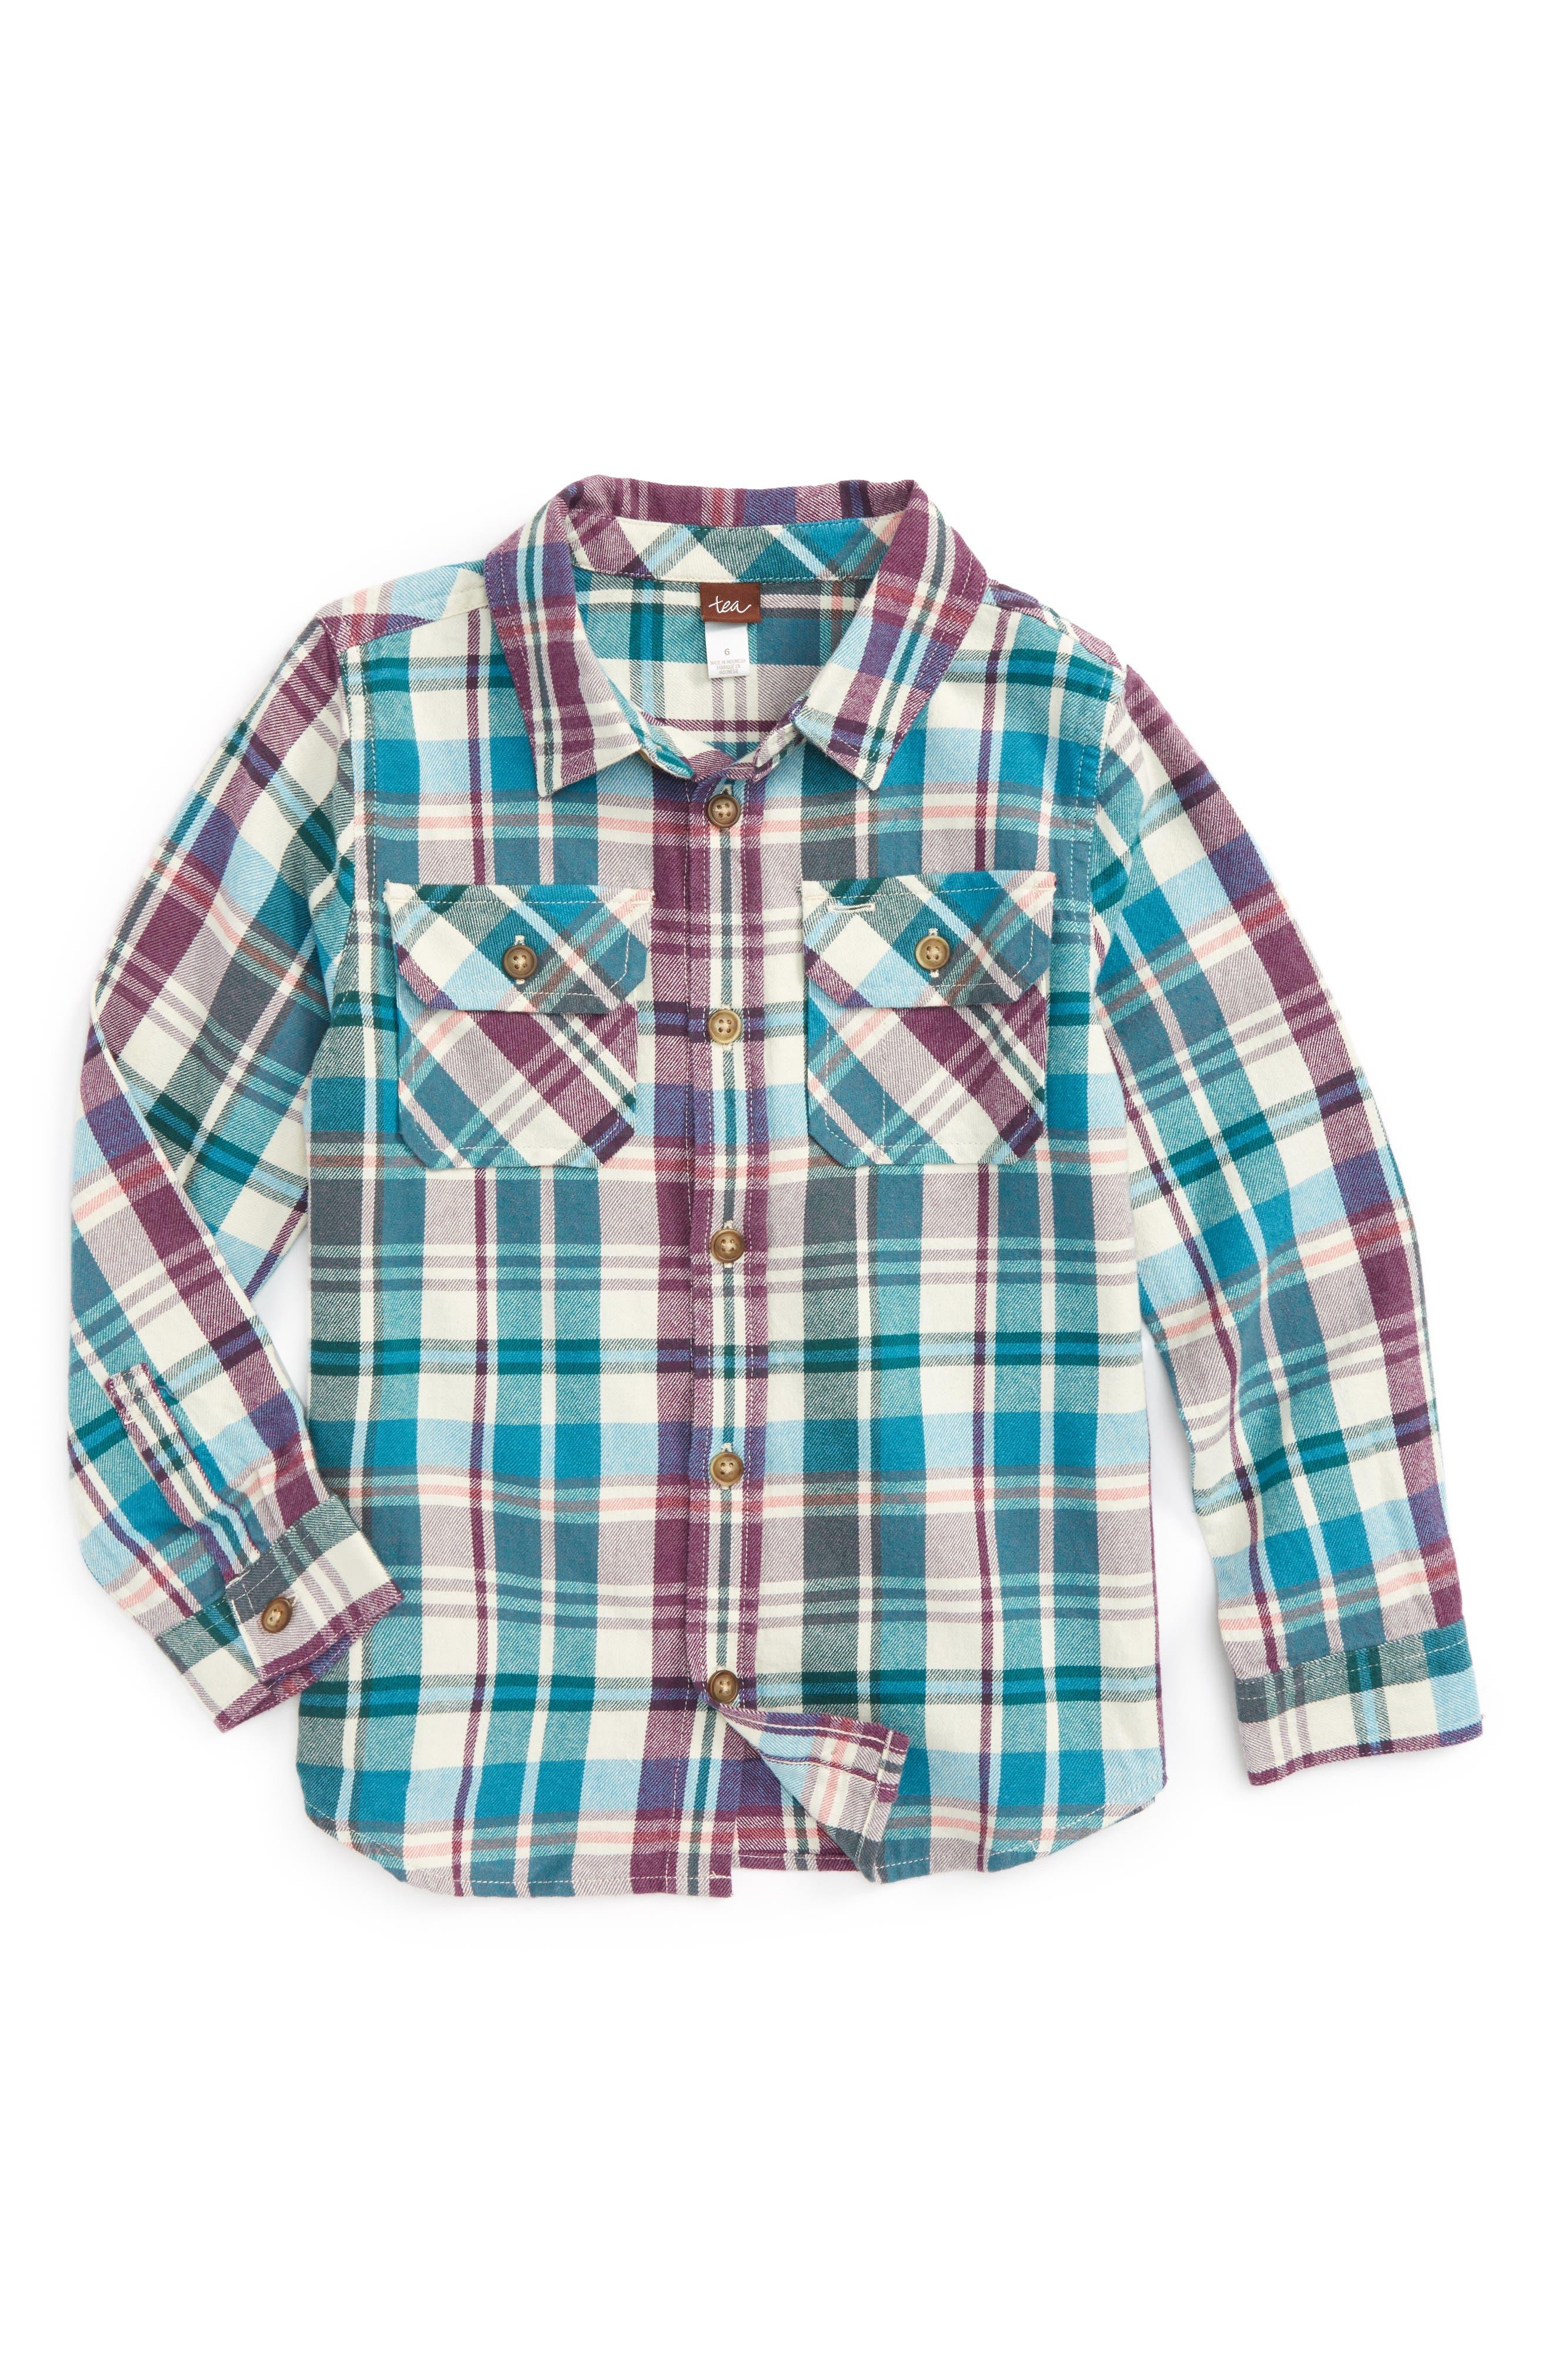 Main Image - Tea Collection Beaufort Plaid Flannel Shirt (Toddler Boys & Little Boys)